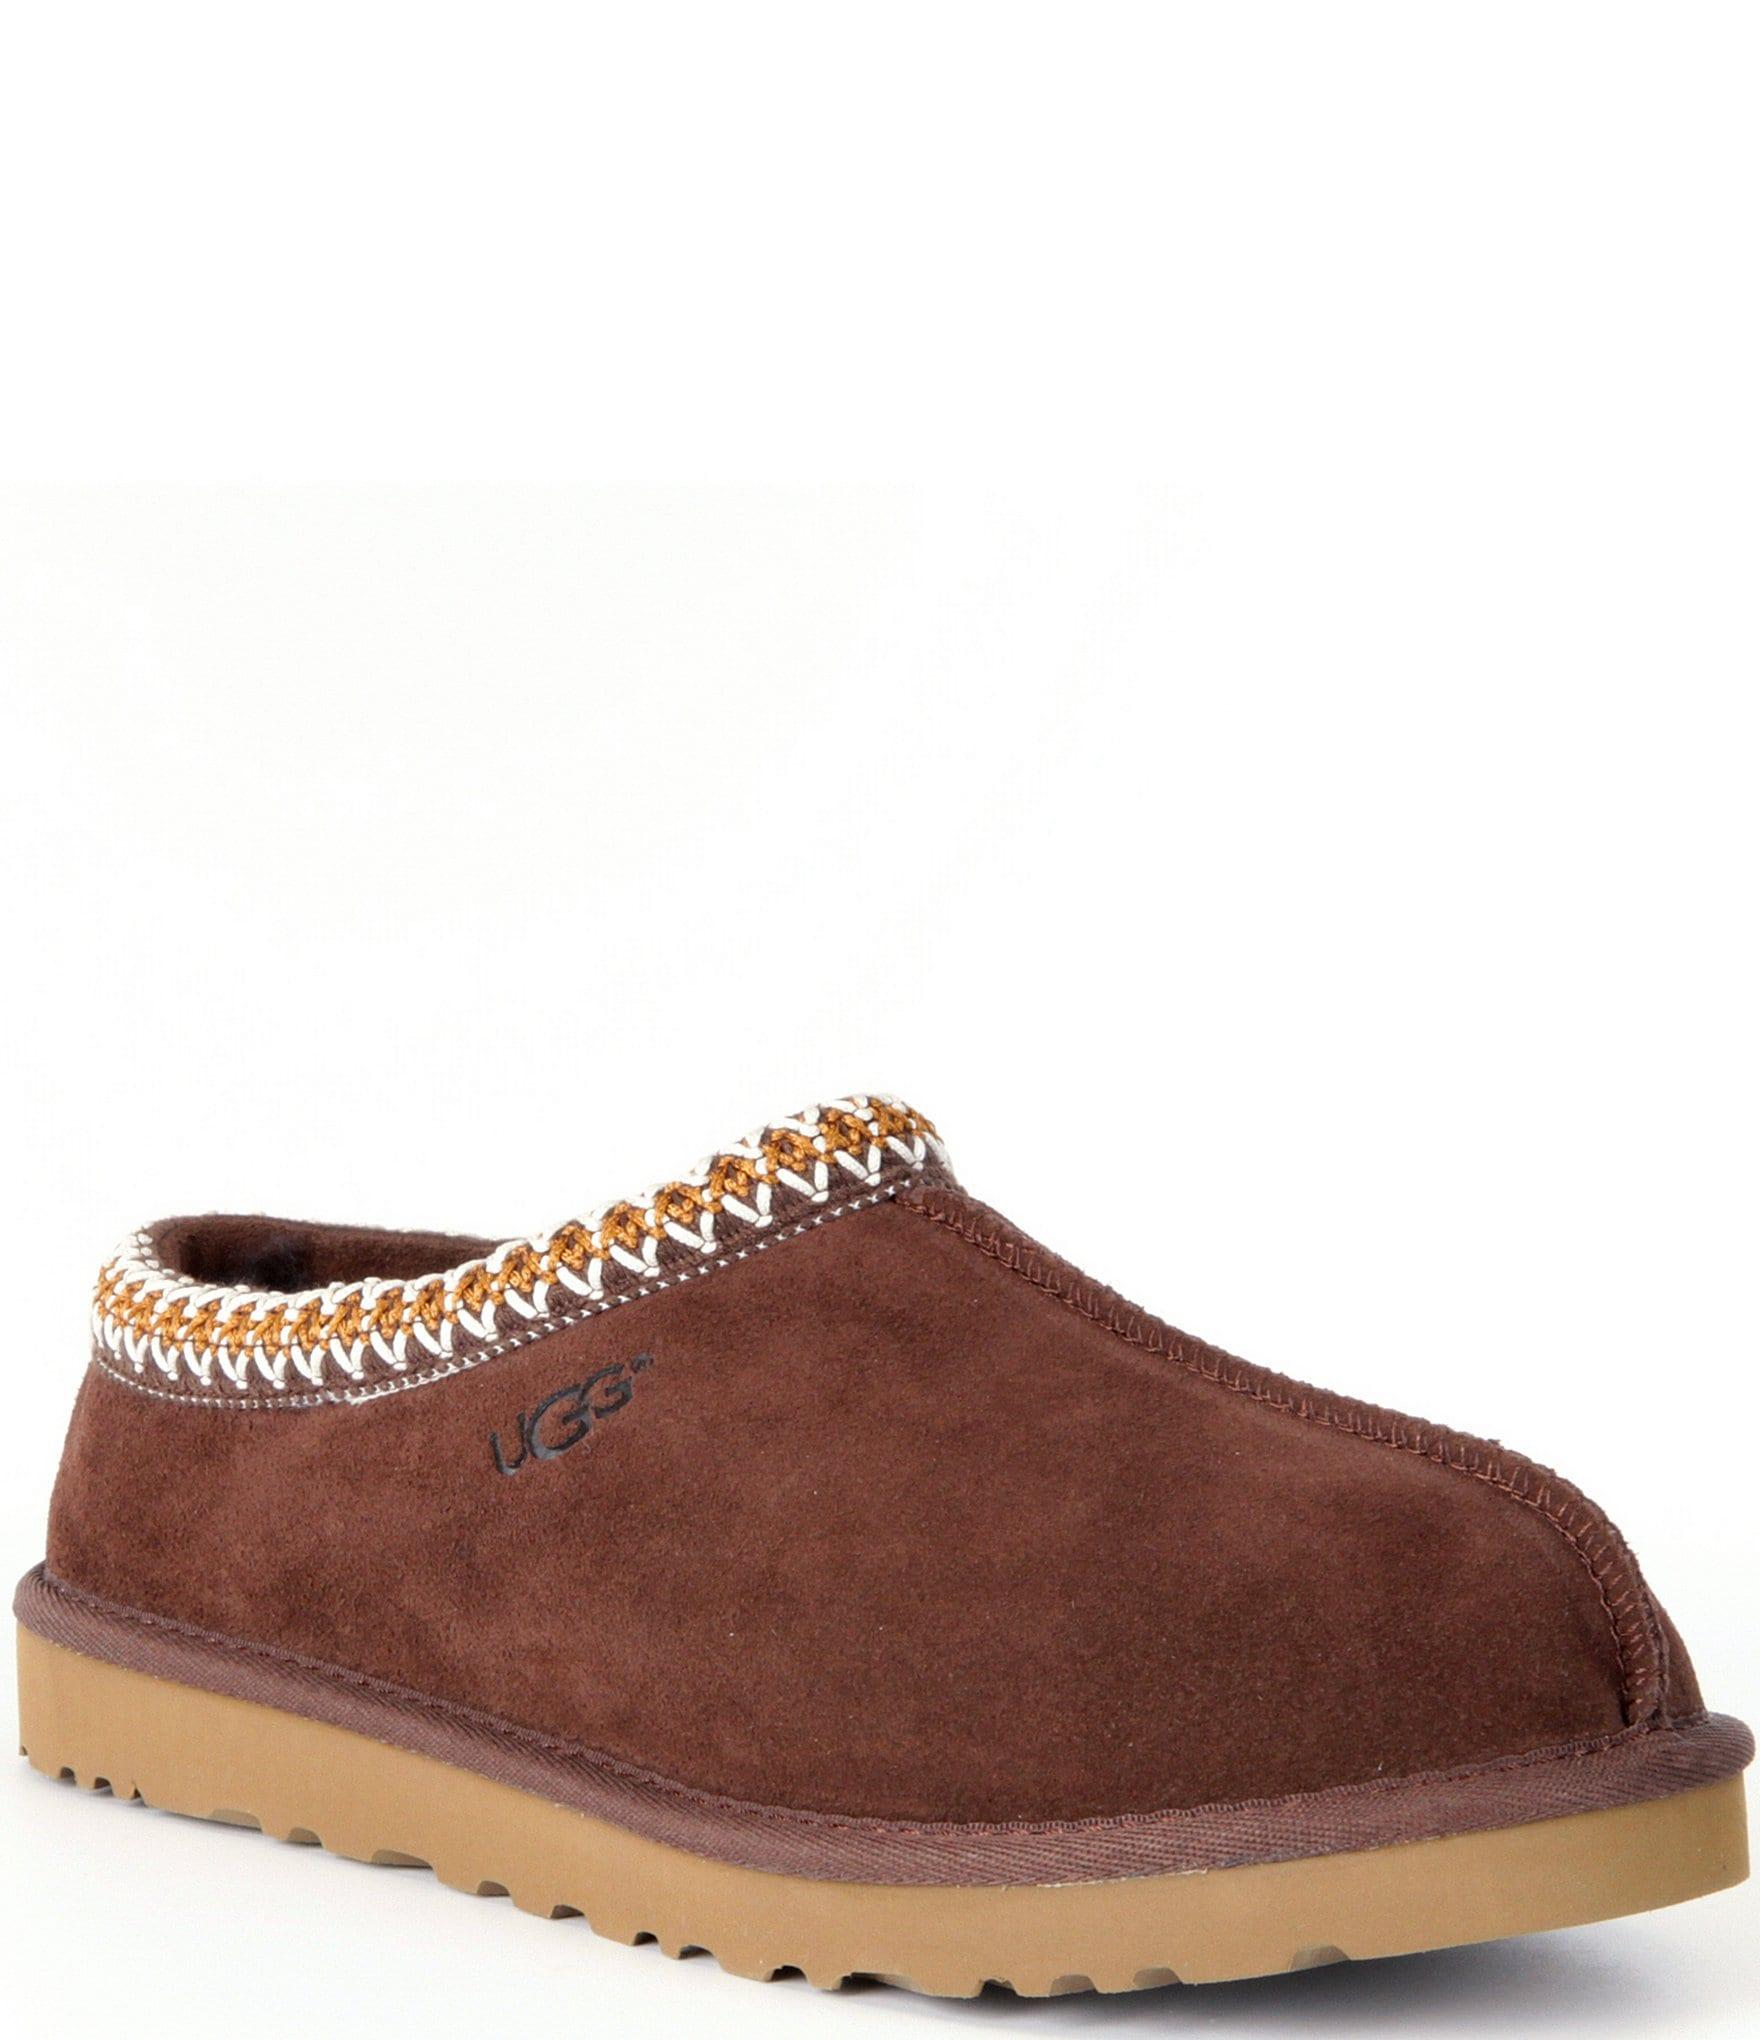 0e1008315f9 UGG® Men s Tasman Suede Slippers